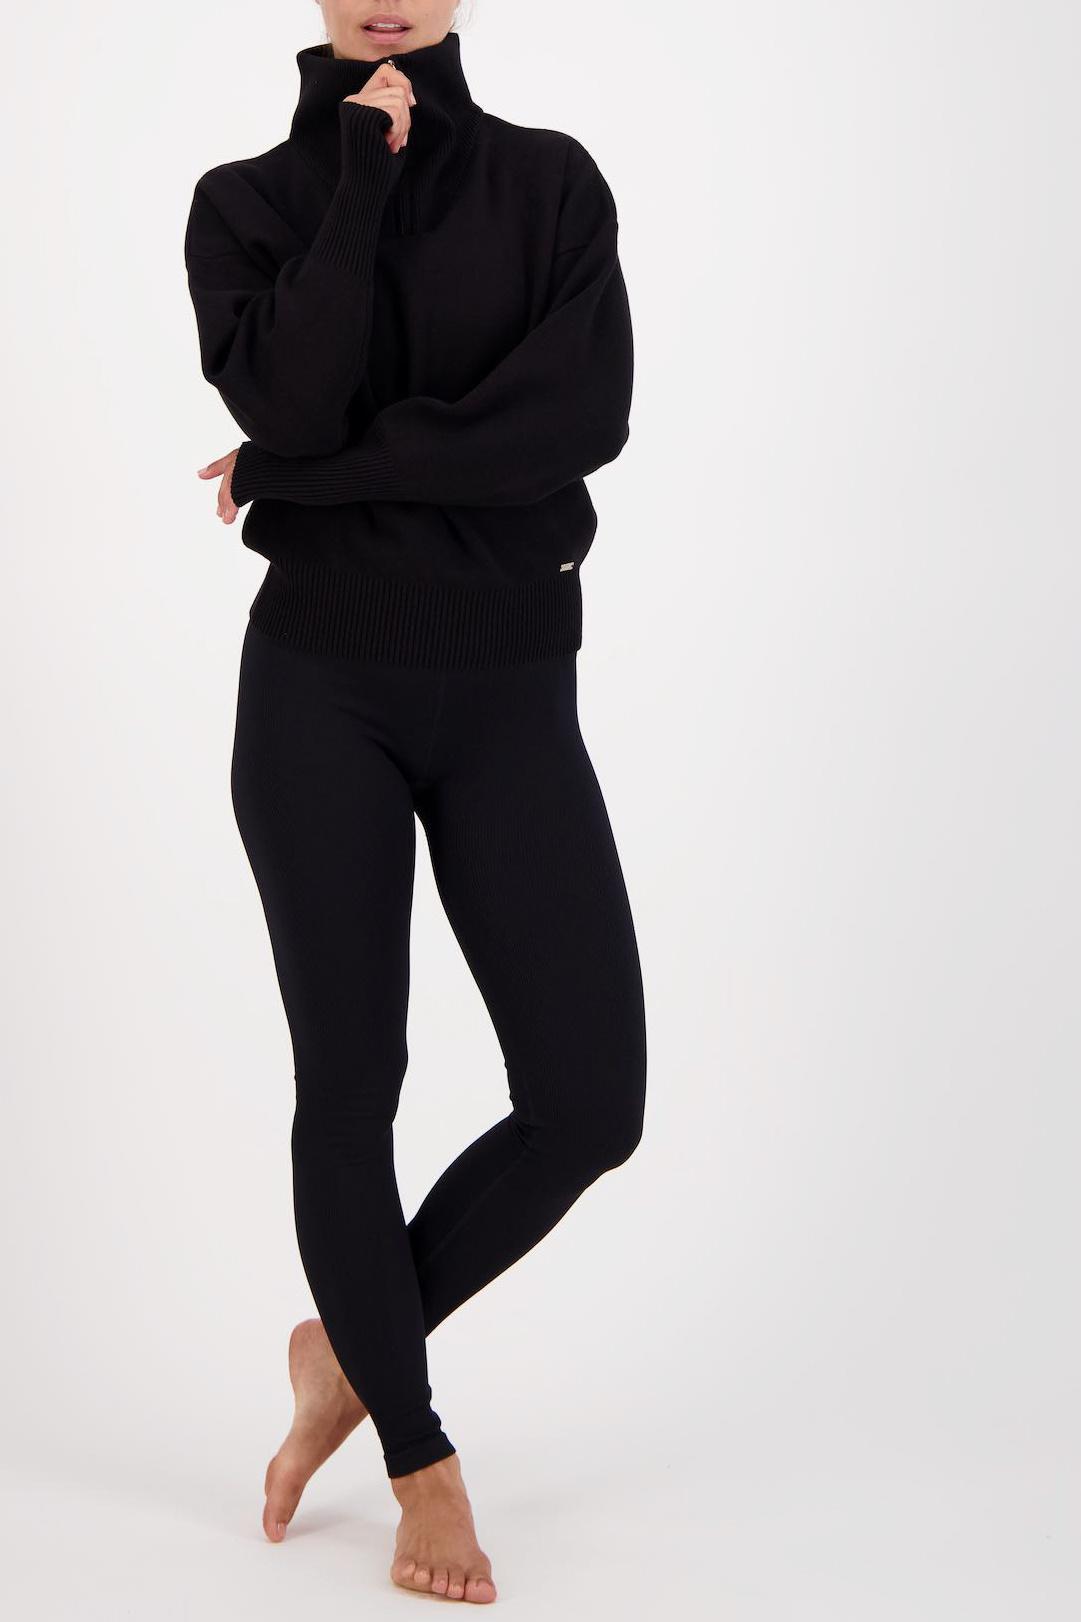 Olly Half-Zip Knit Sweater - Black-5